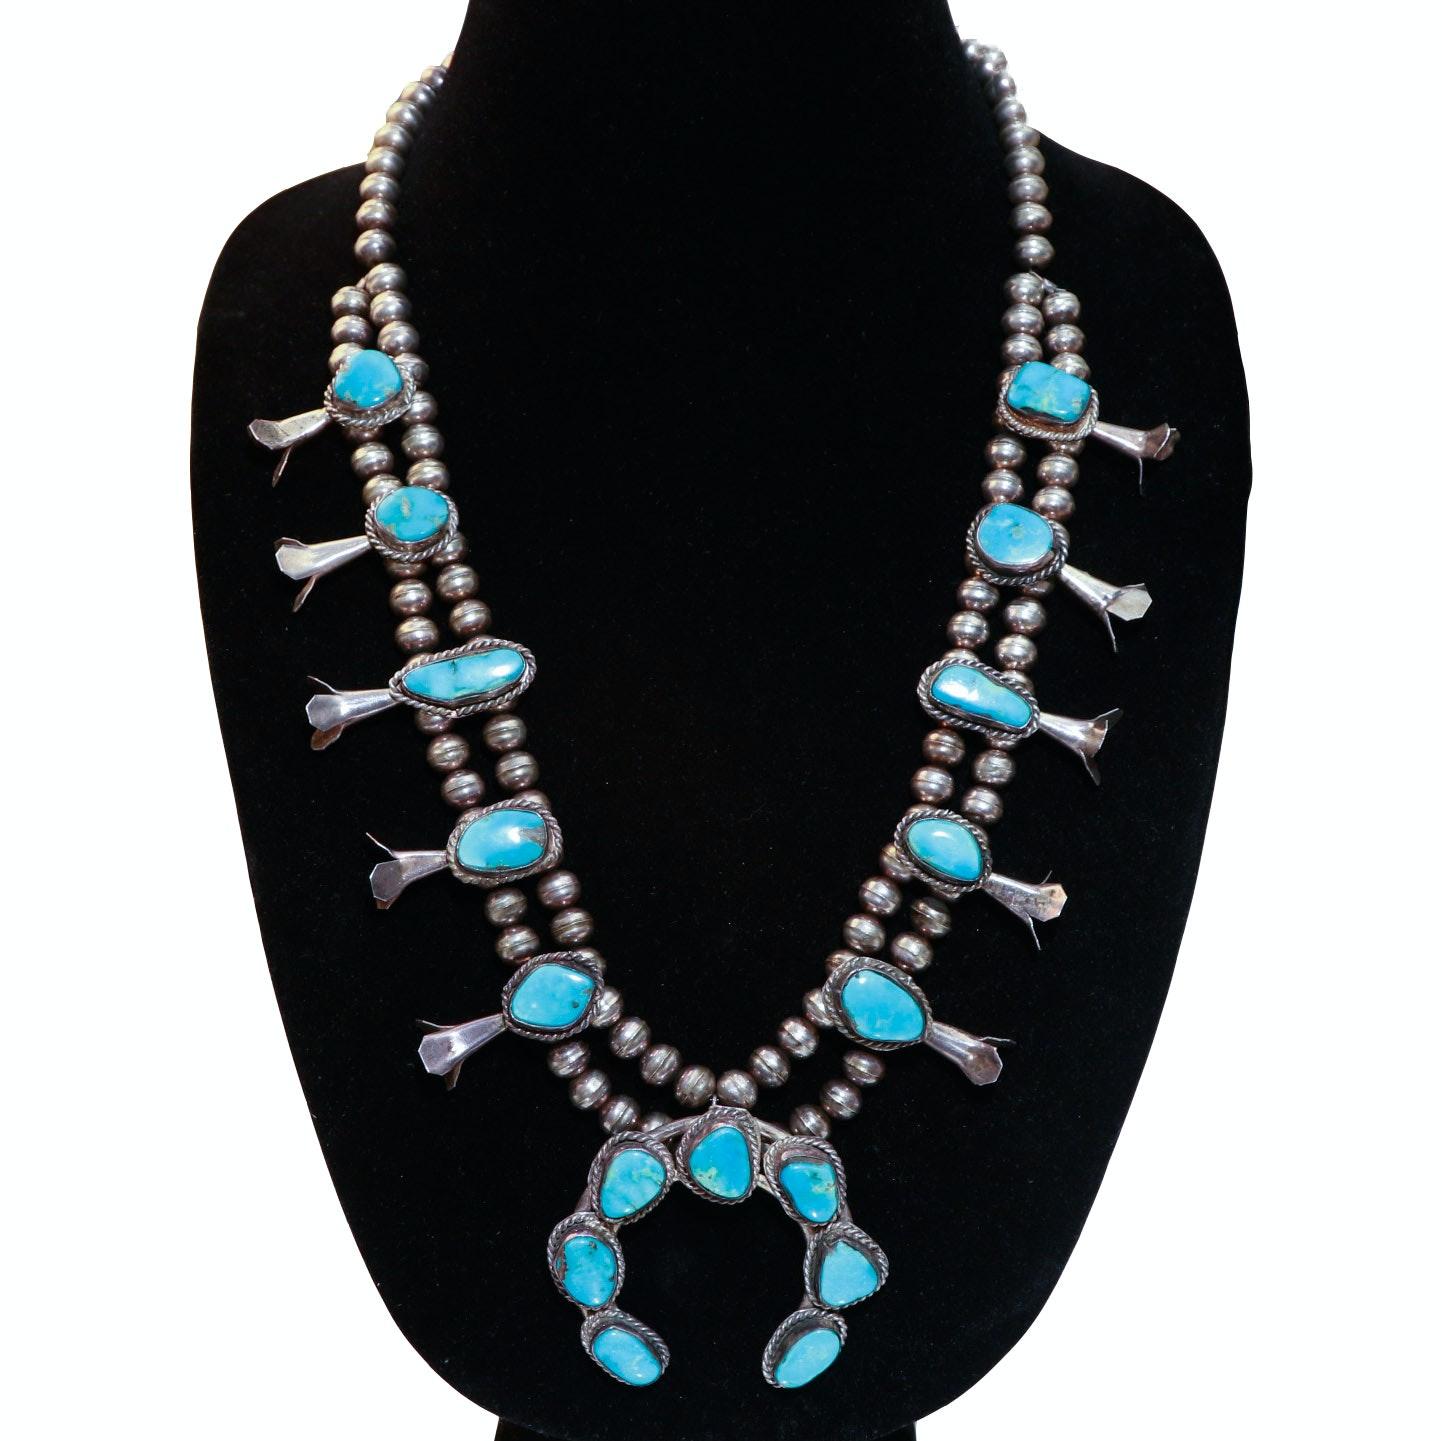 Navajo Sterling Silver Squash Blossom Necklace